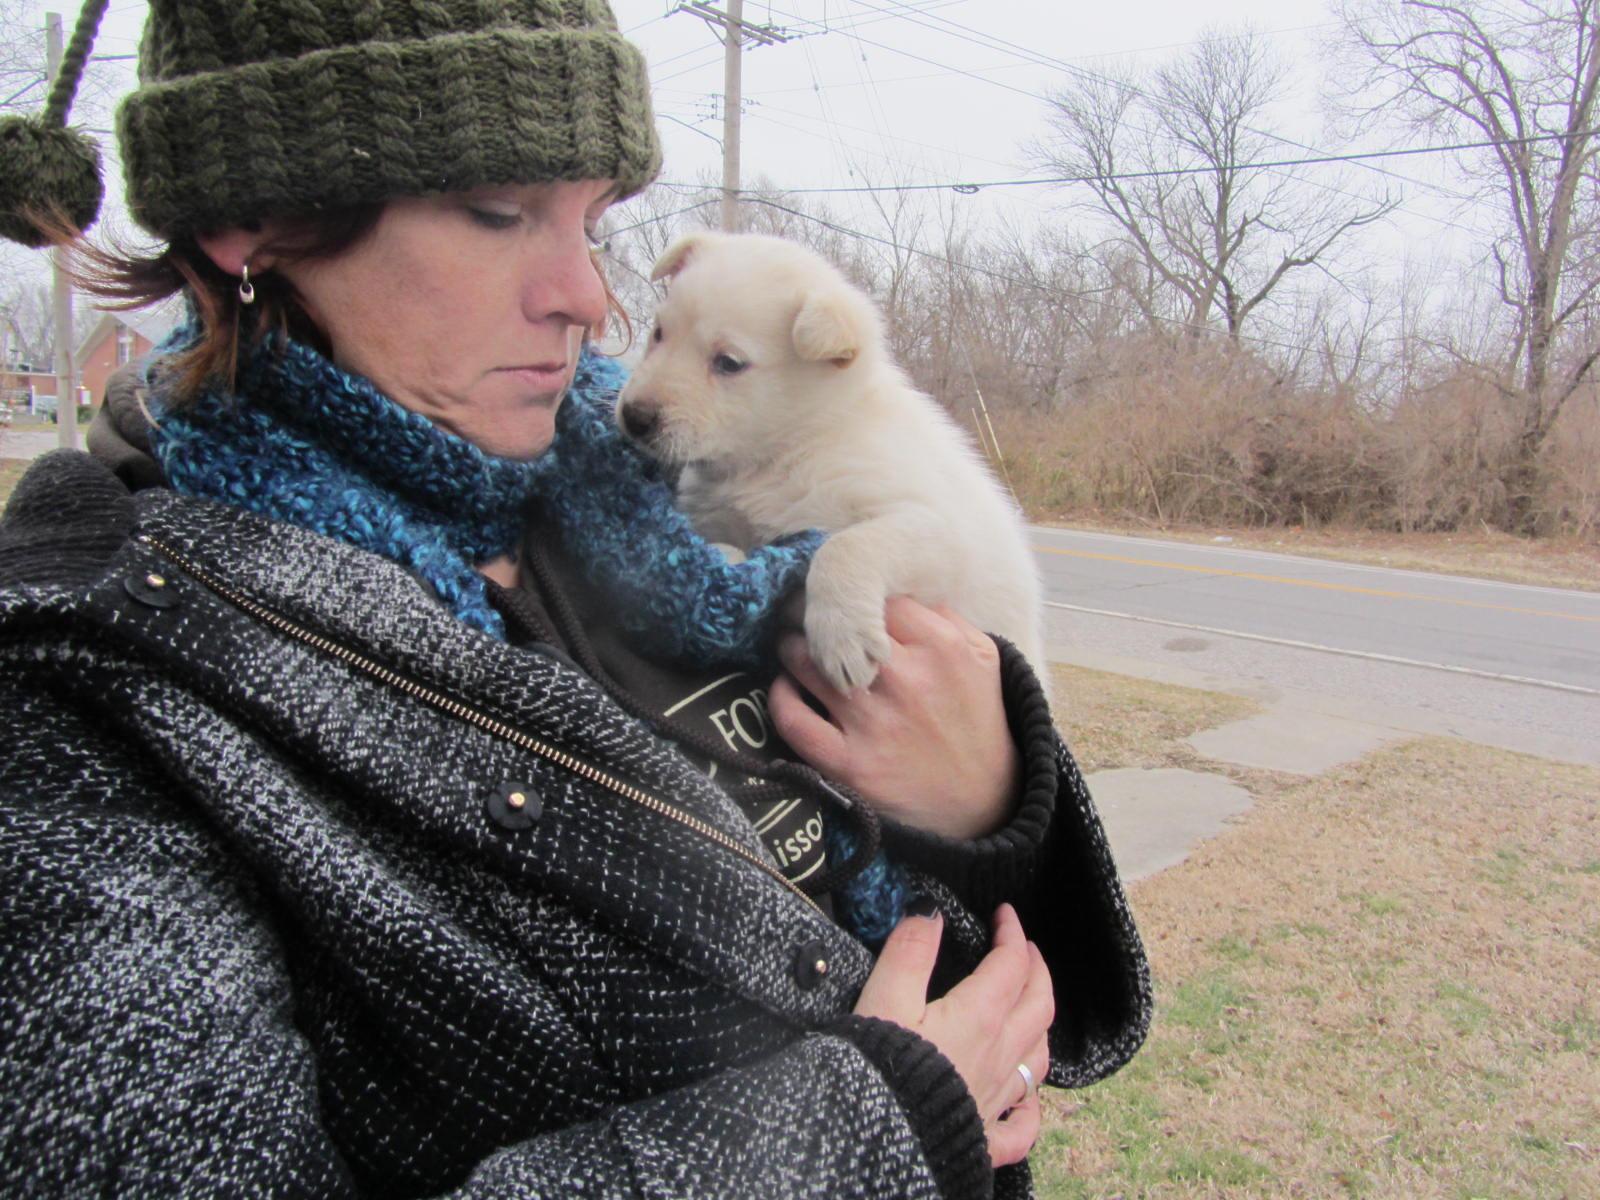 Karen Goodman with East St. Louis puppy